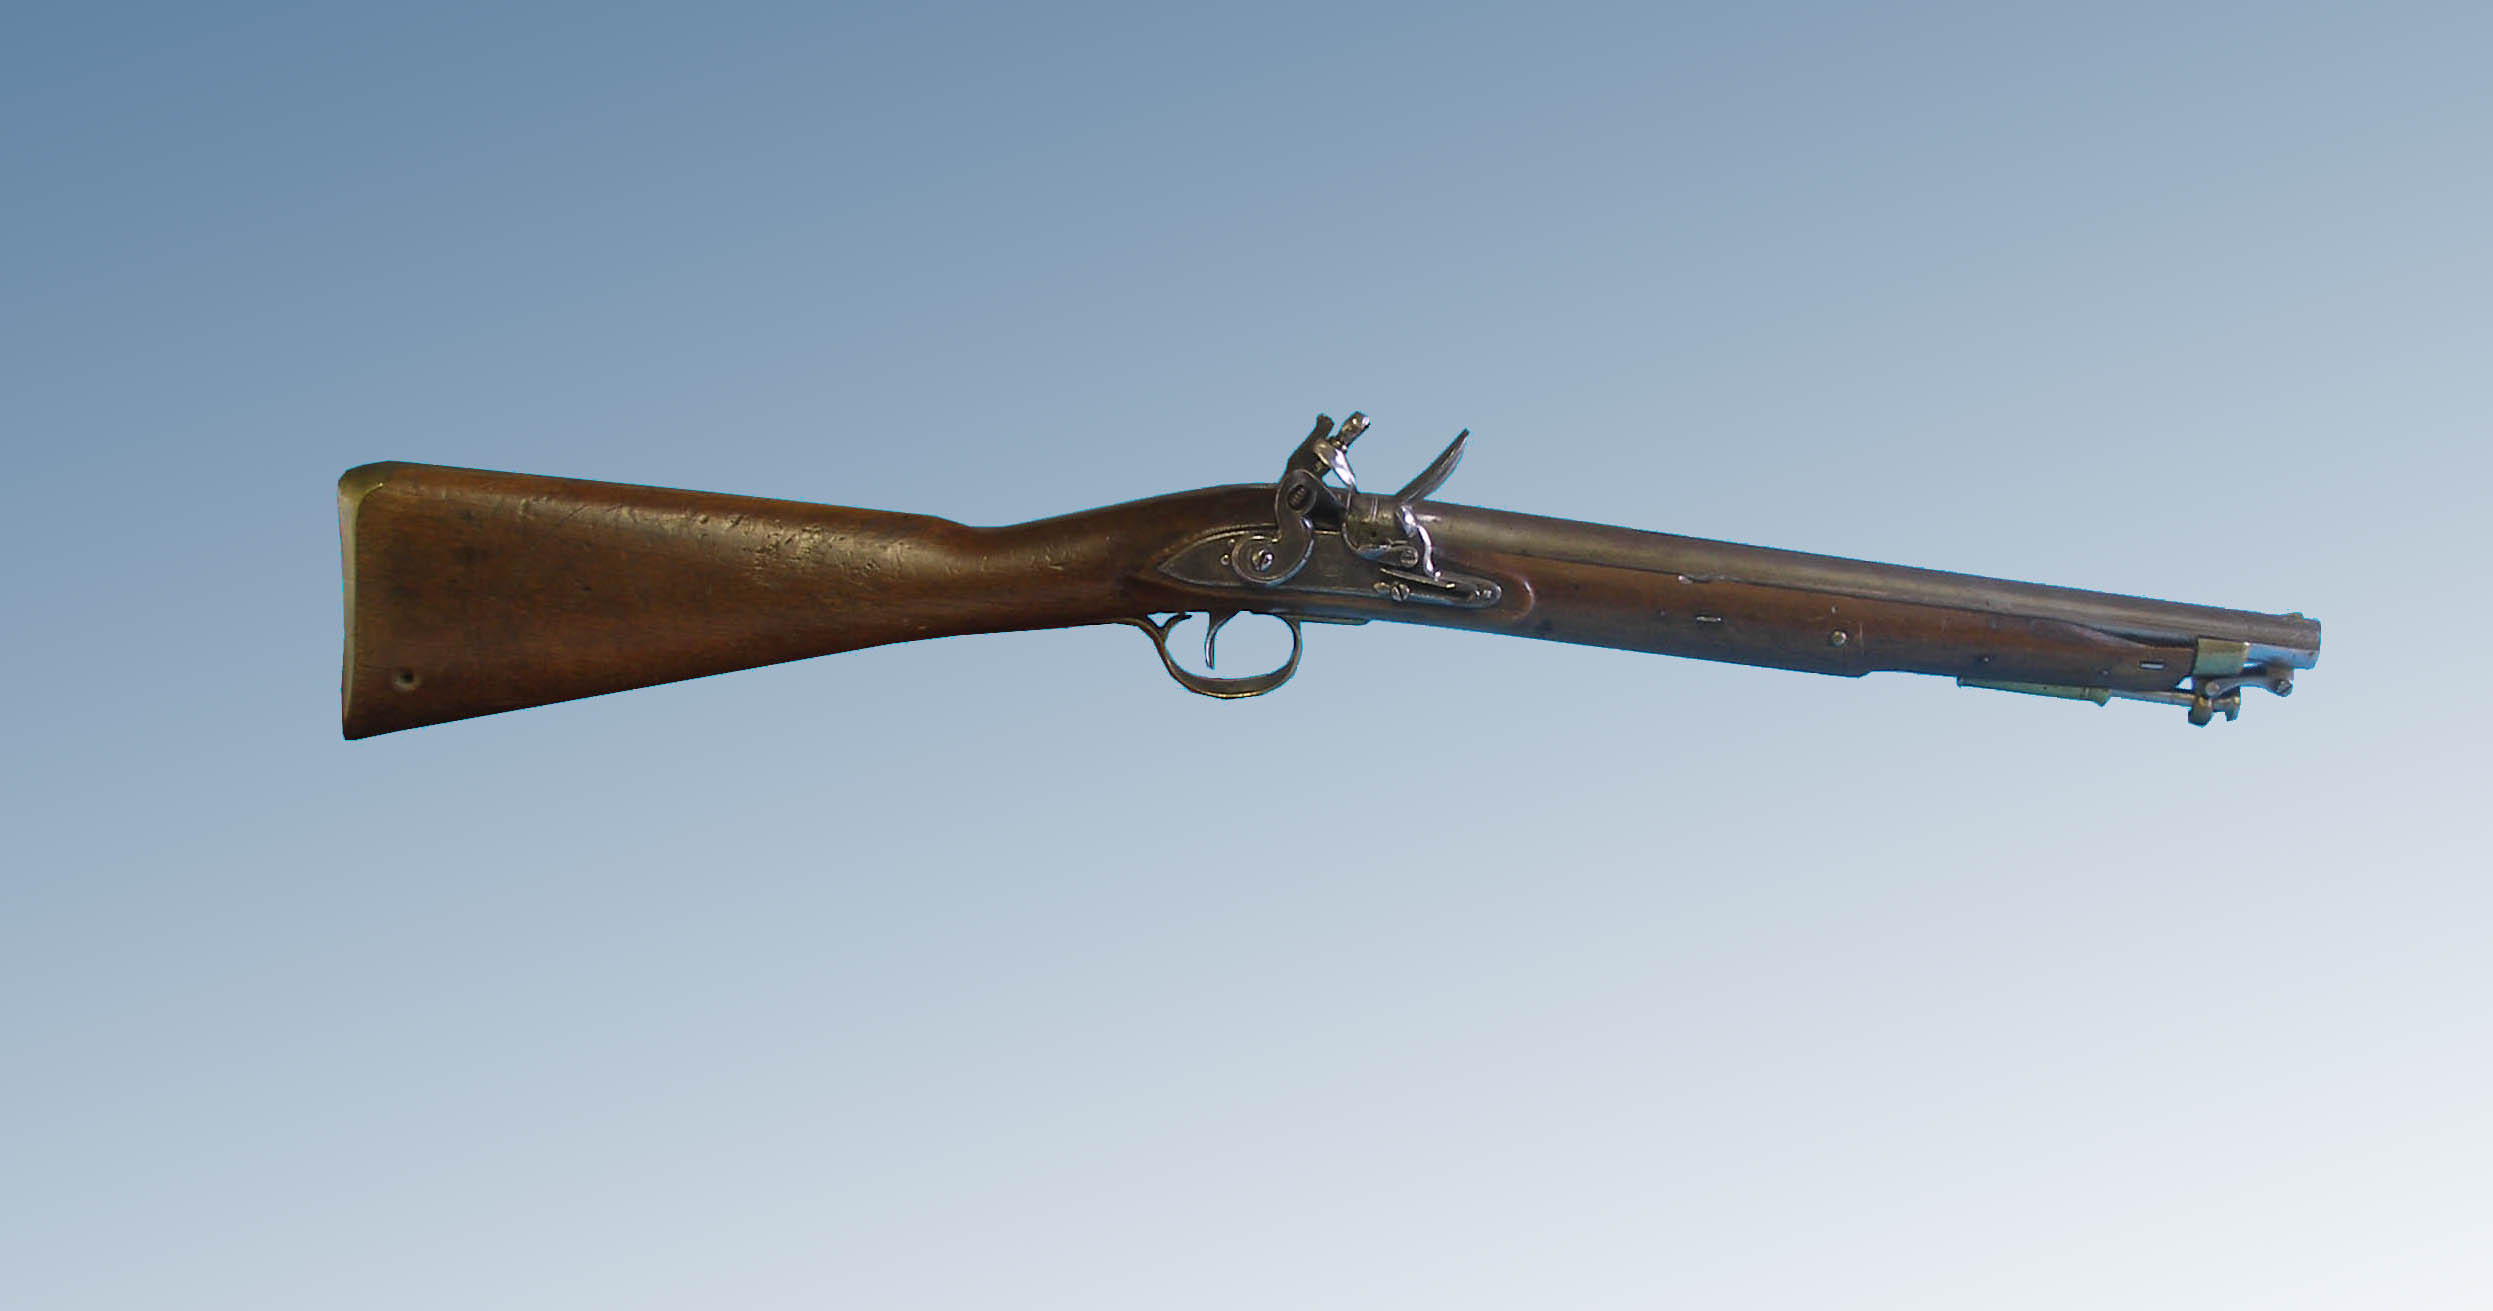 Carabina Paget modelo 1808 para la Caballería Ligera británica